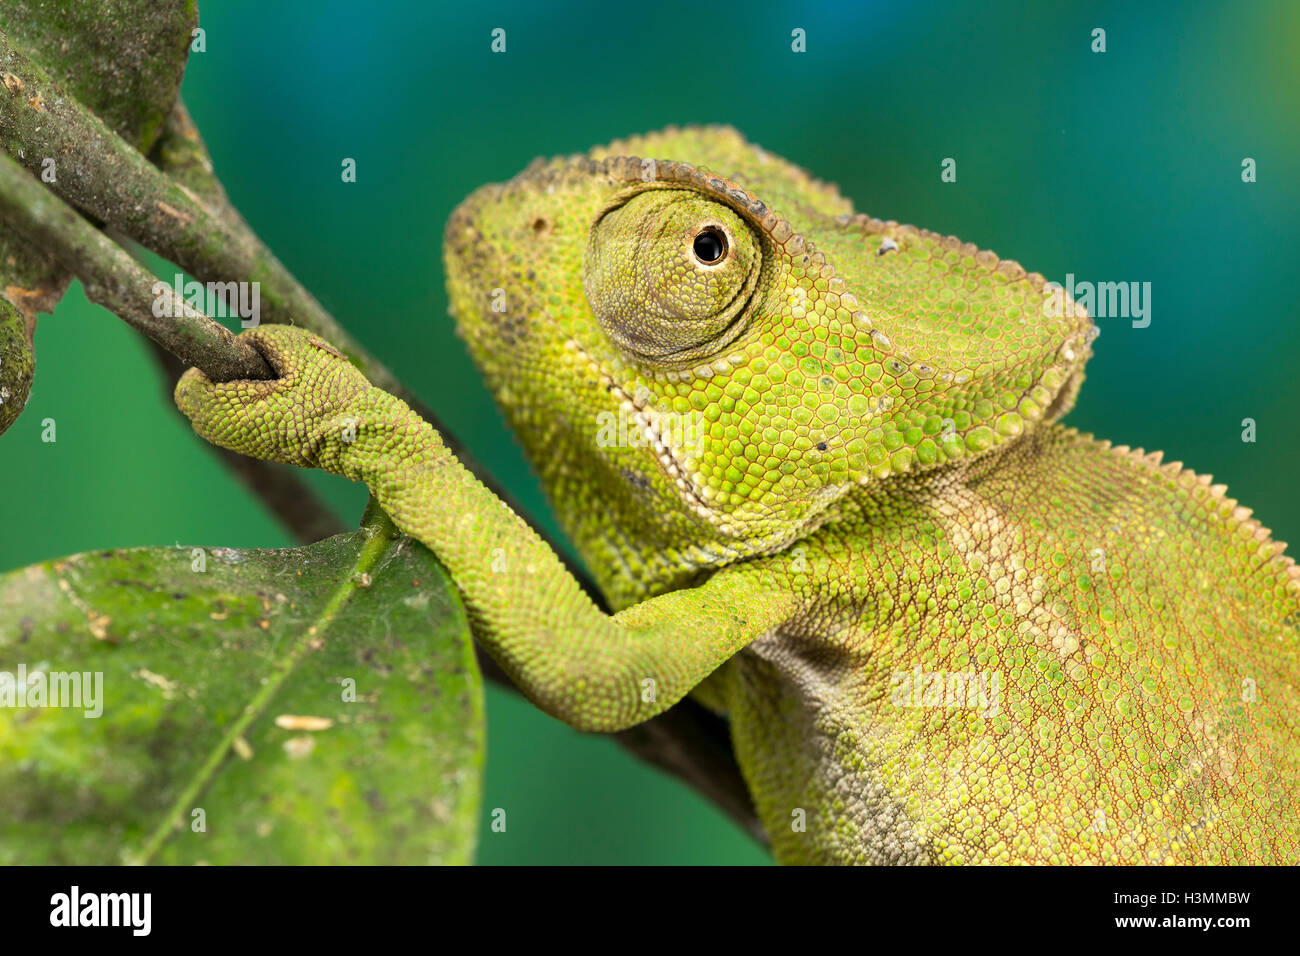 Close up di un verde di medie dimensioni chameleon Immagini Stock